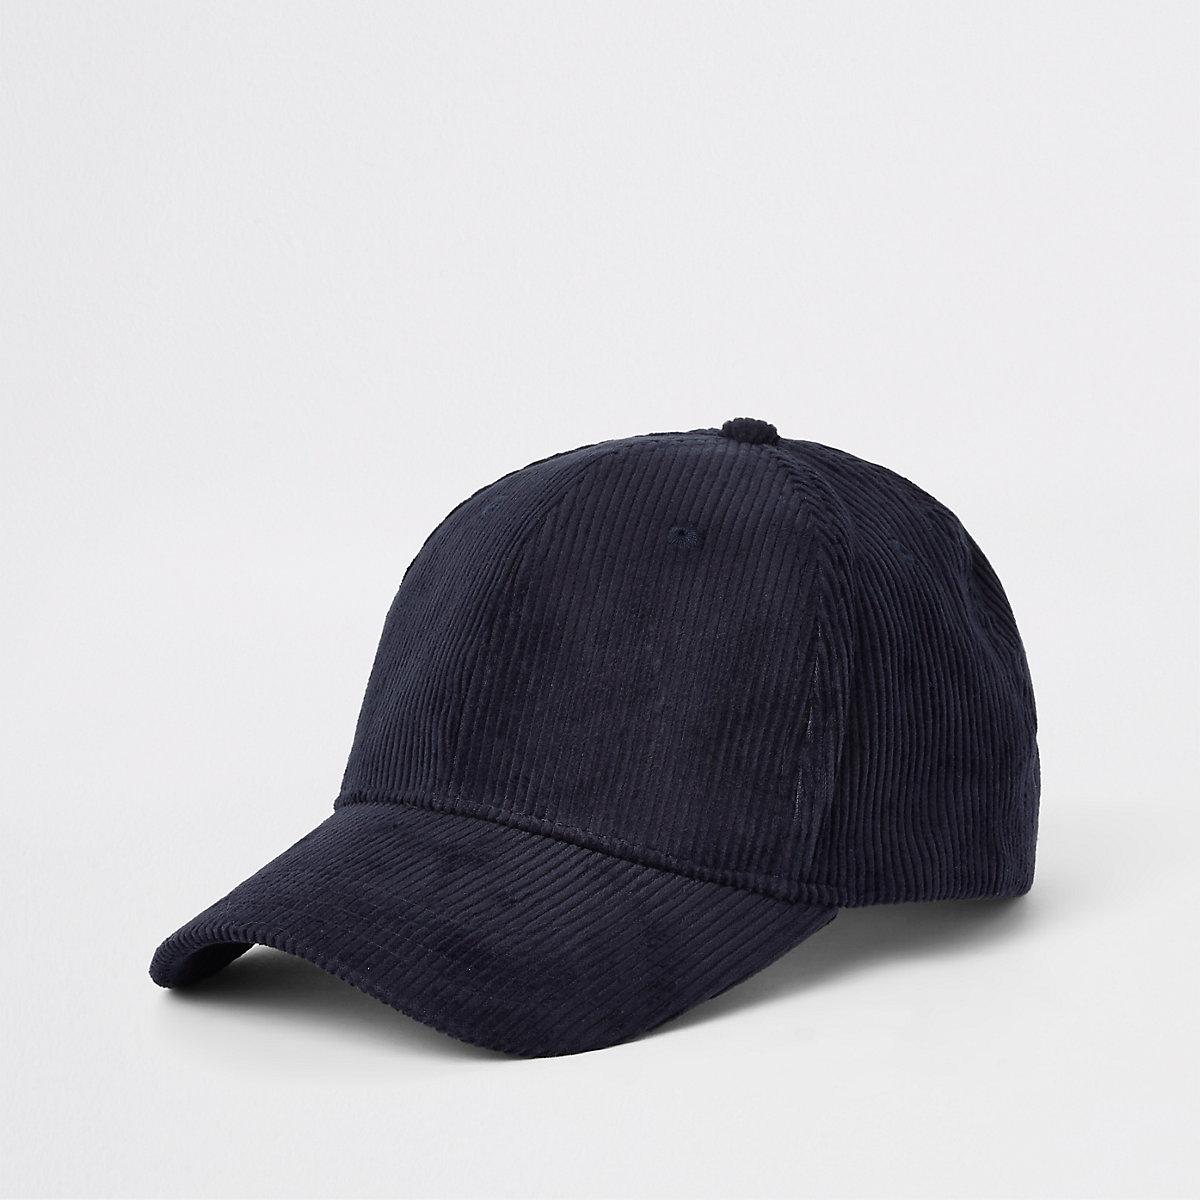 Navy cord baseball cap